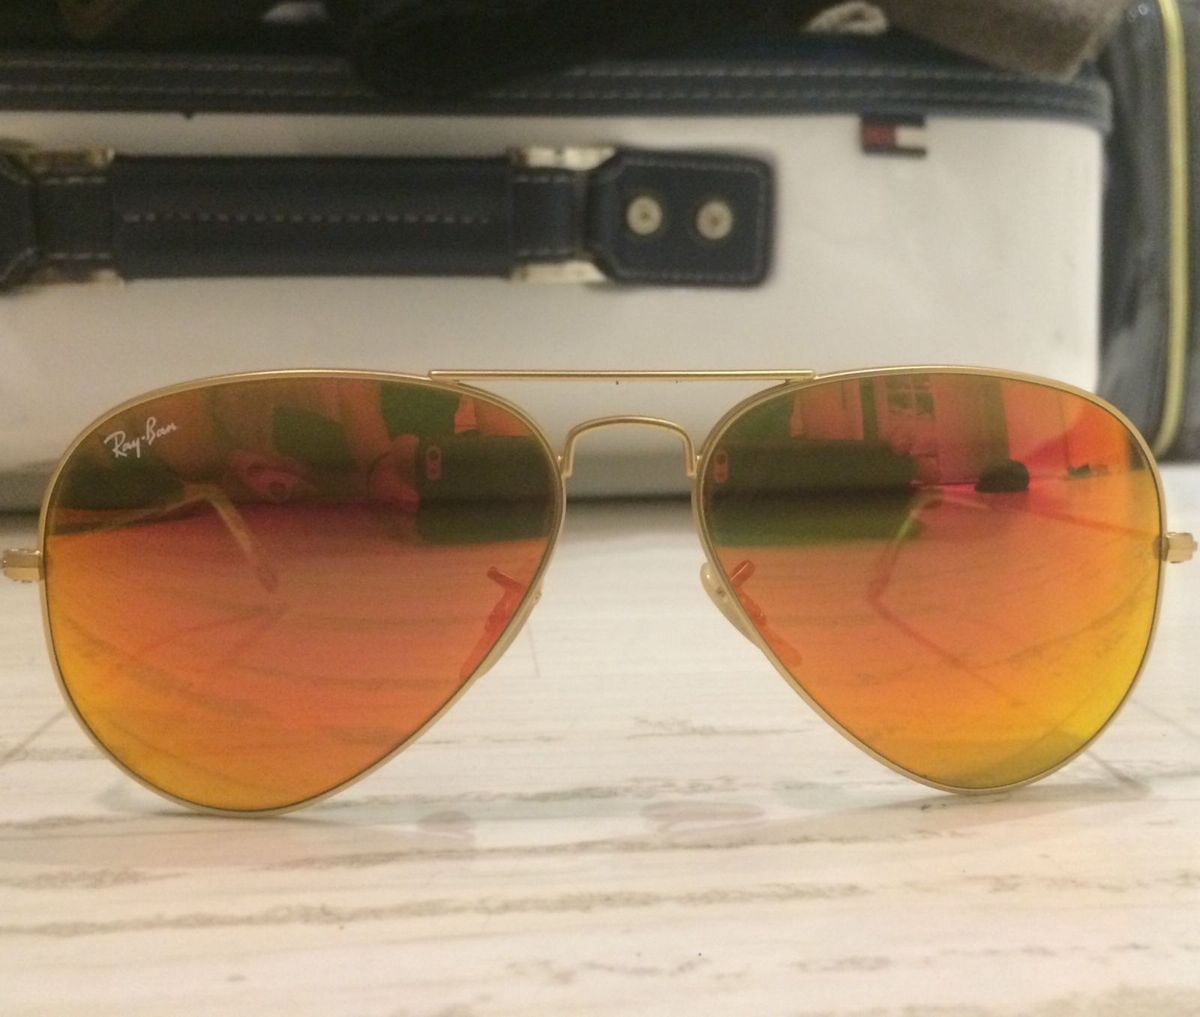 óculos rayban lente espelhada - óculos rayban.  Czm6ly9wag90b3muzw5qb2vplmnvbs5ici9wcm9kdwn0cy80ntayntq1l2q3mjbhztm5zmu1yjmxndaymgm3ywzhztewnguwnjrhlmpwzw  ... c82491c0df